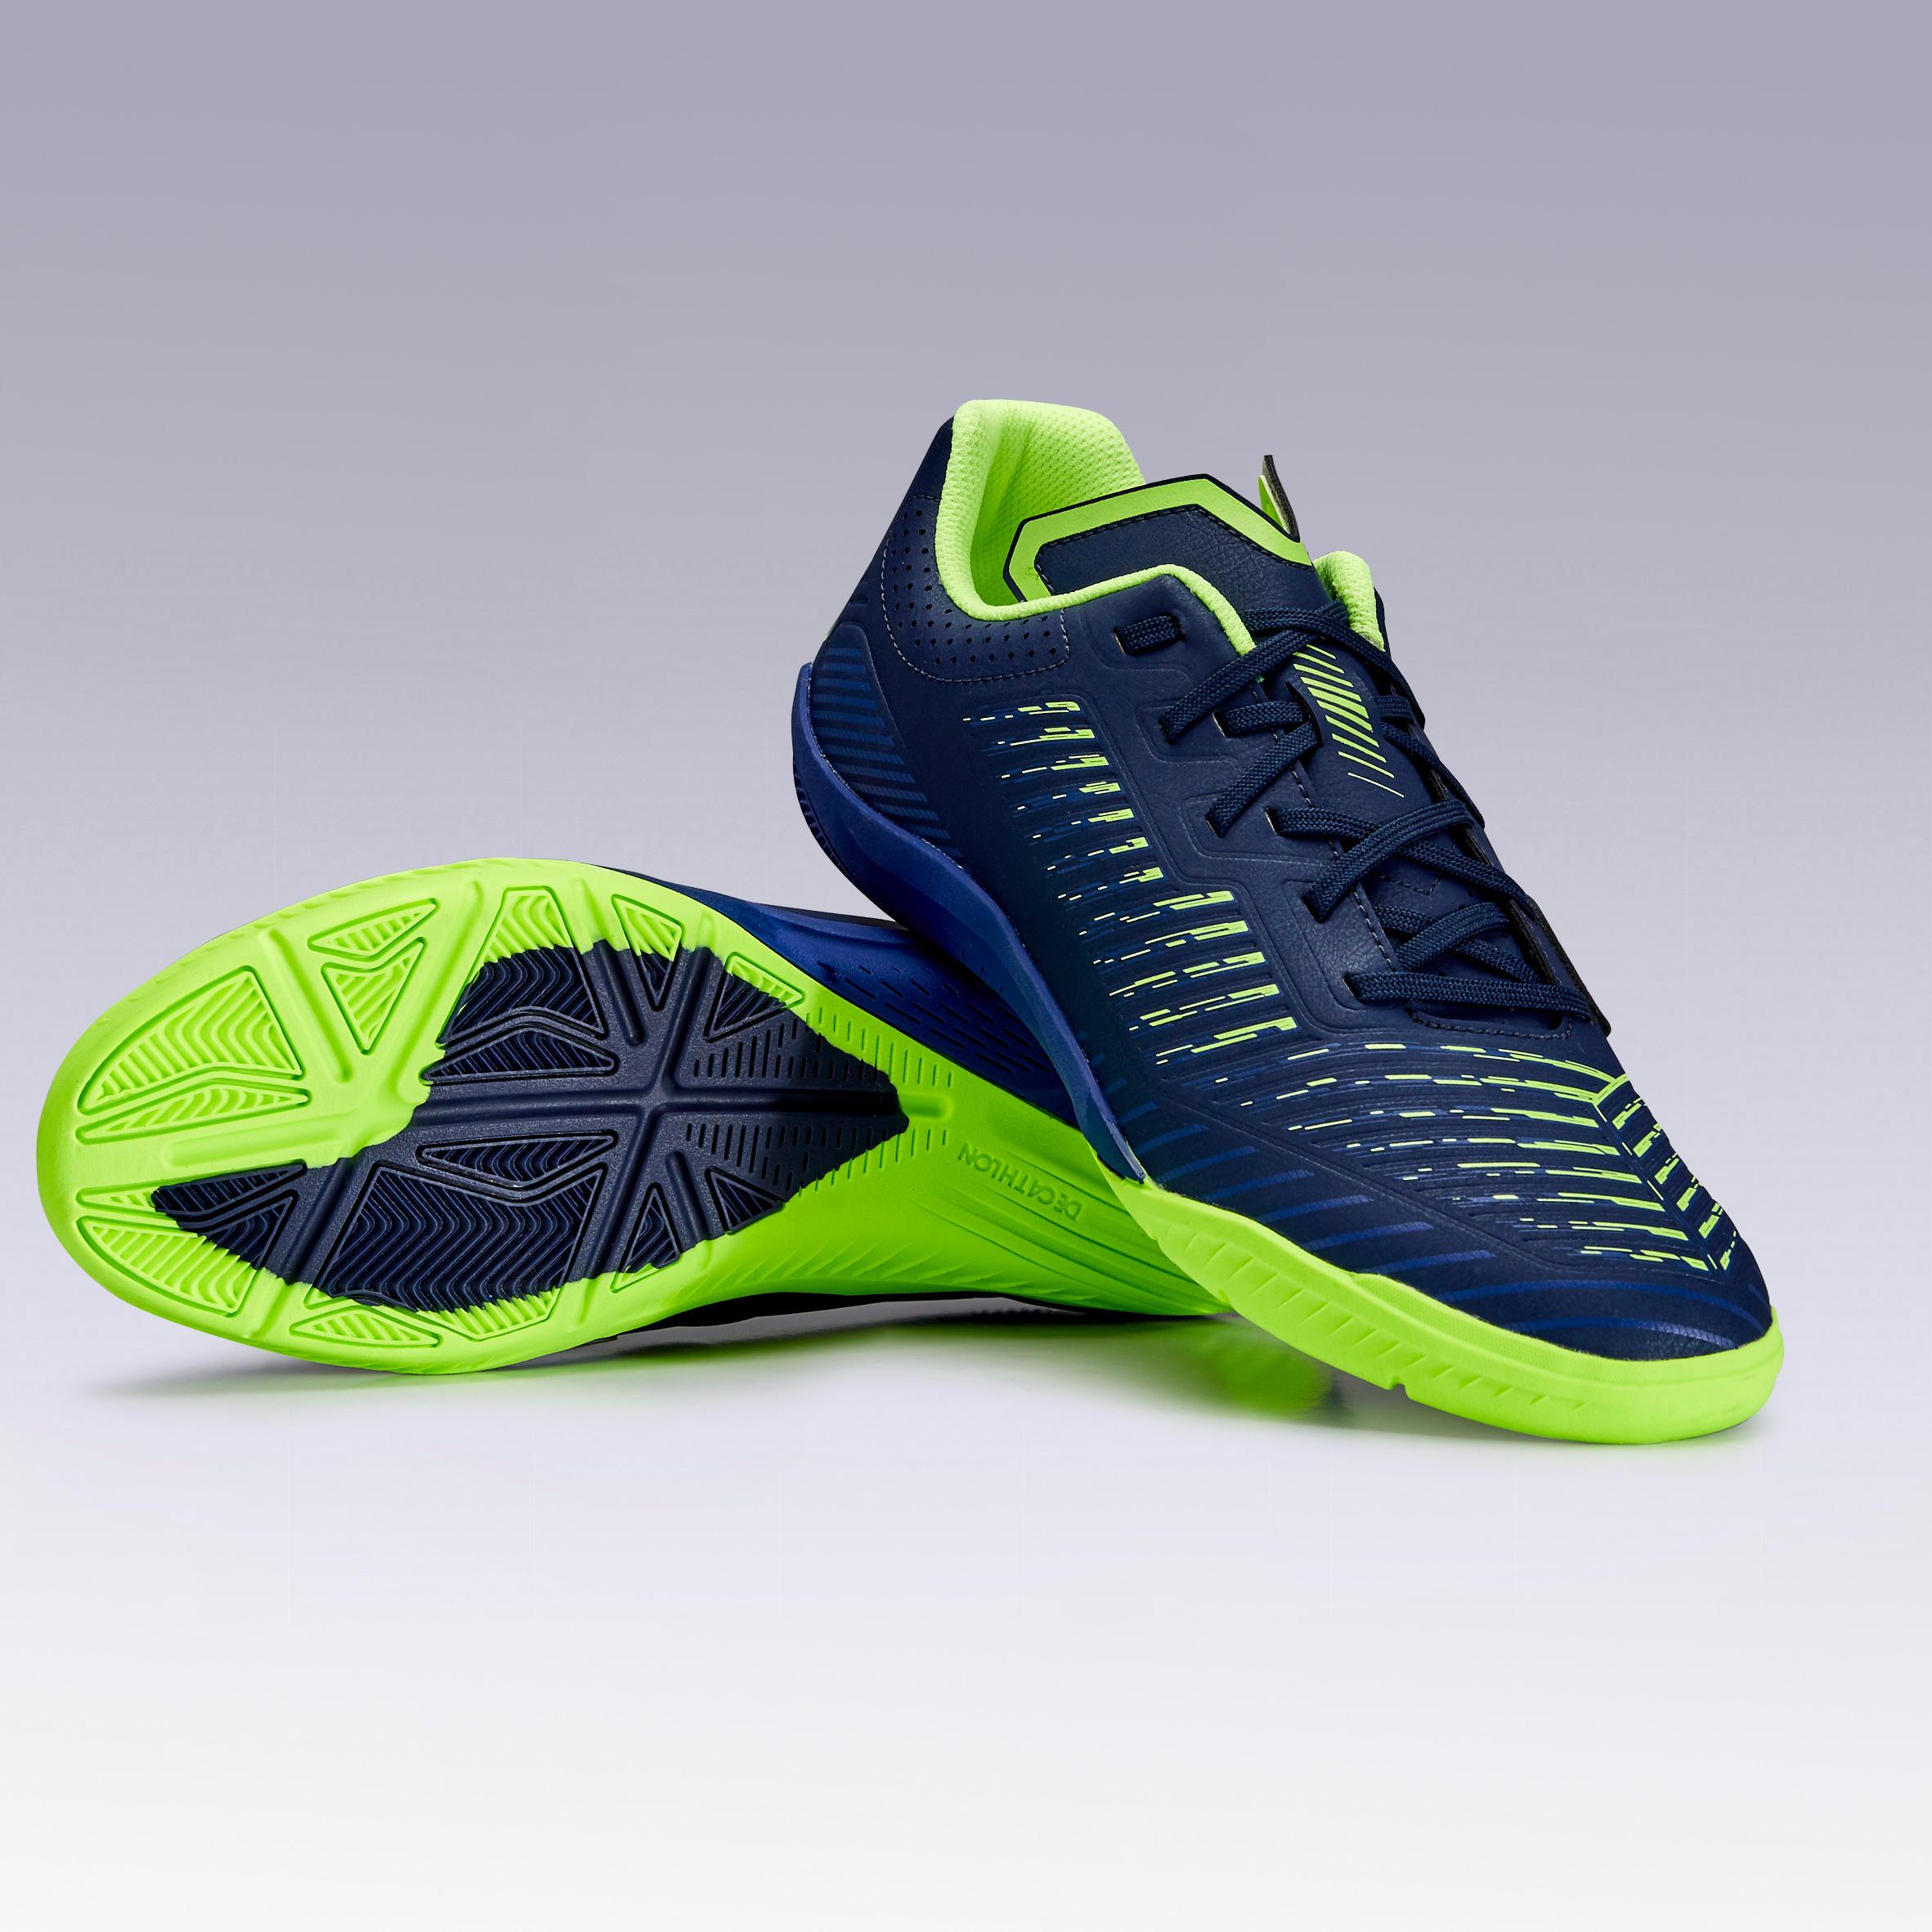 Men's Futsal Shoes Ginka 500 - Dark Blue